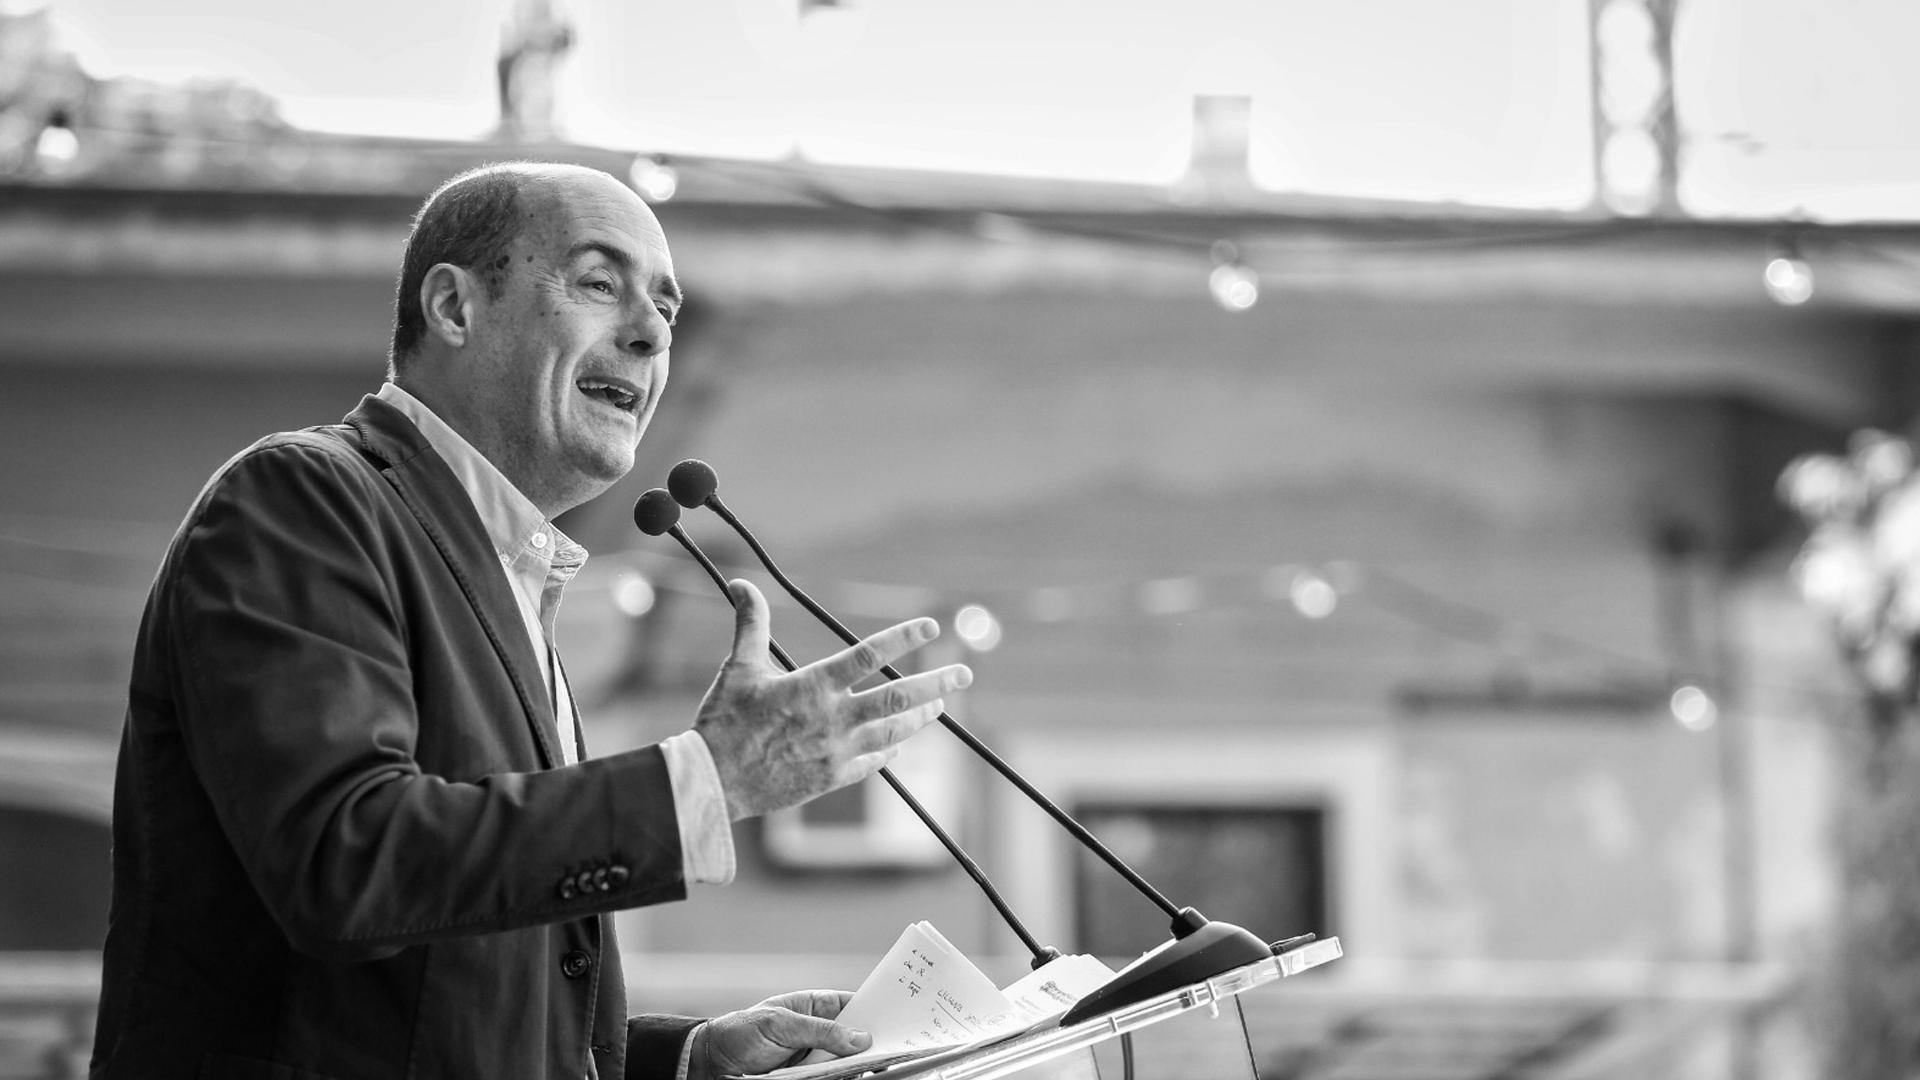 Nicola Zingaretti PD